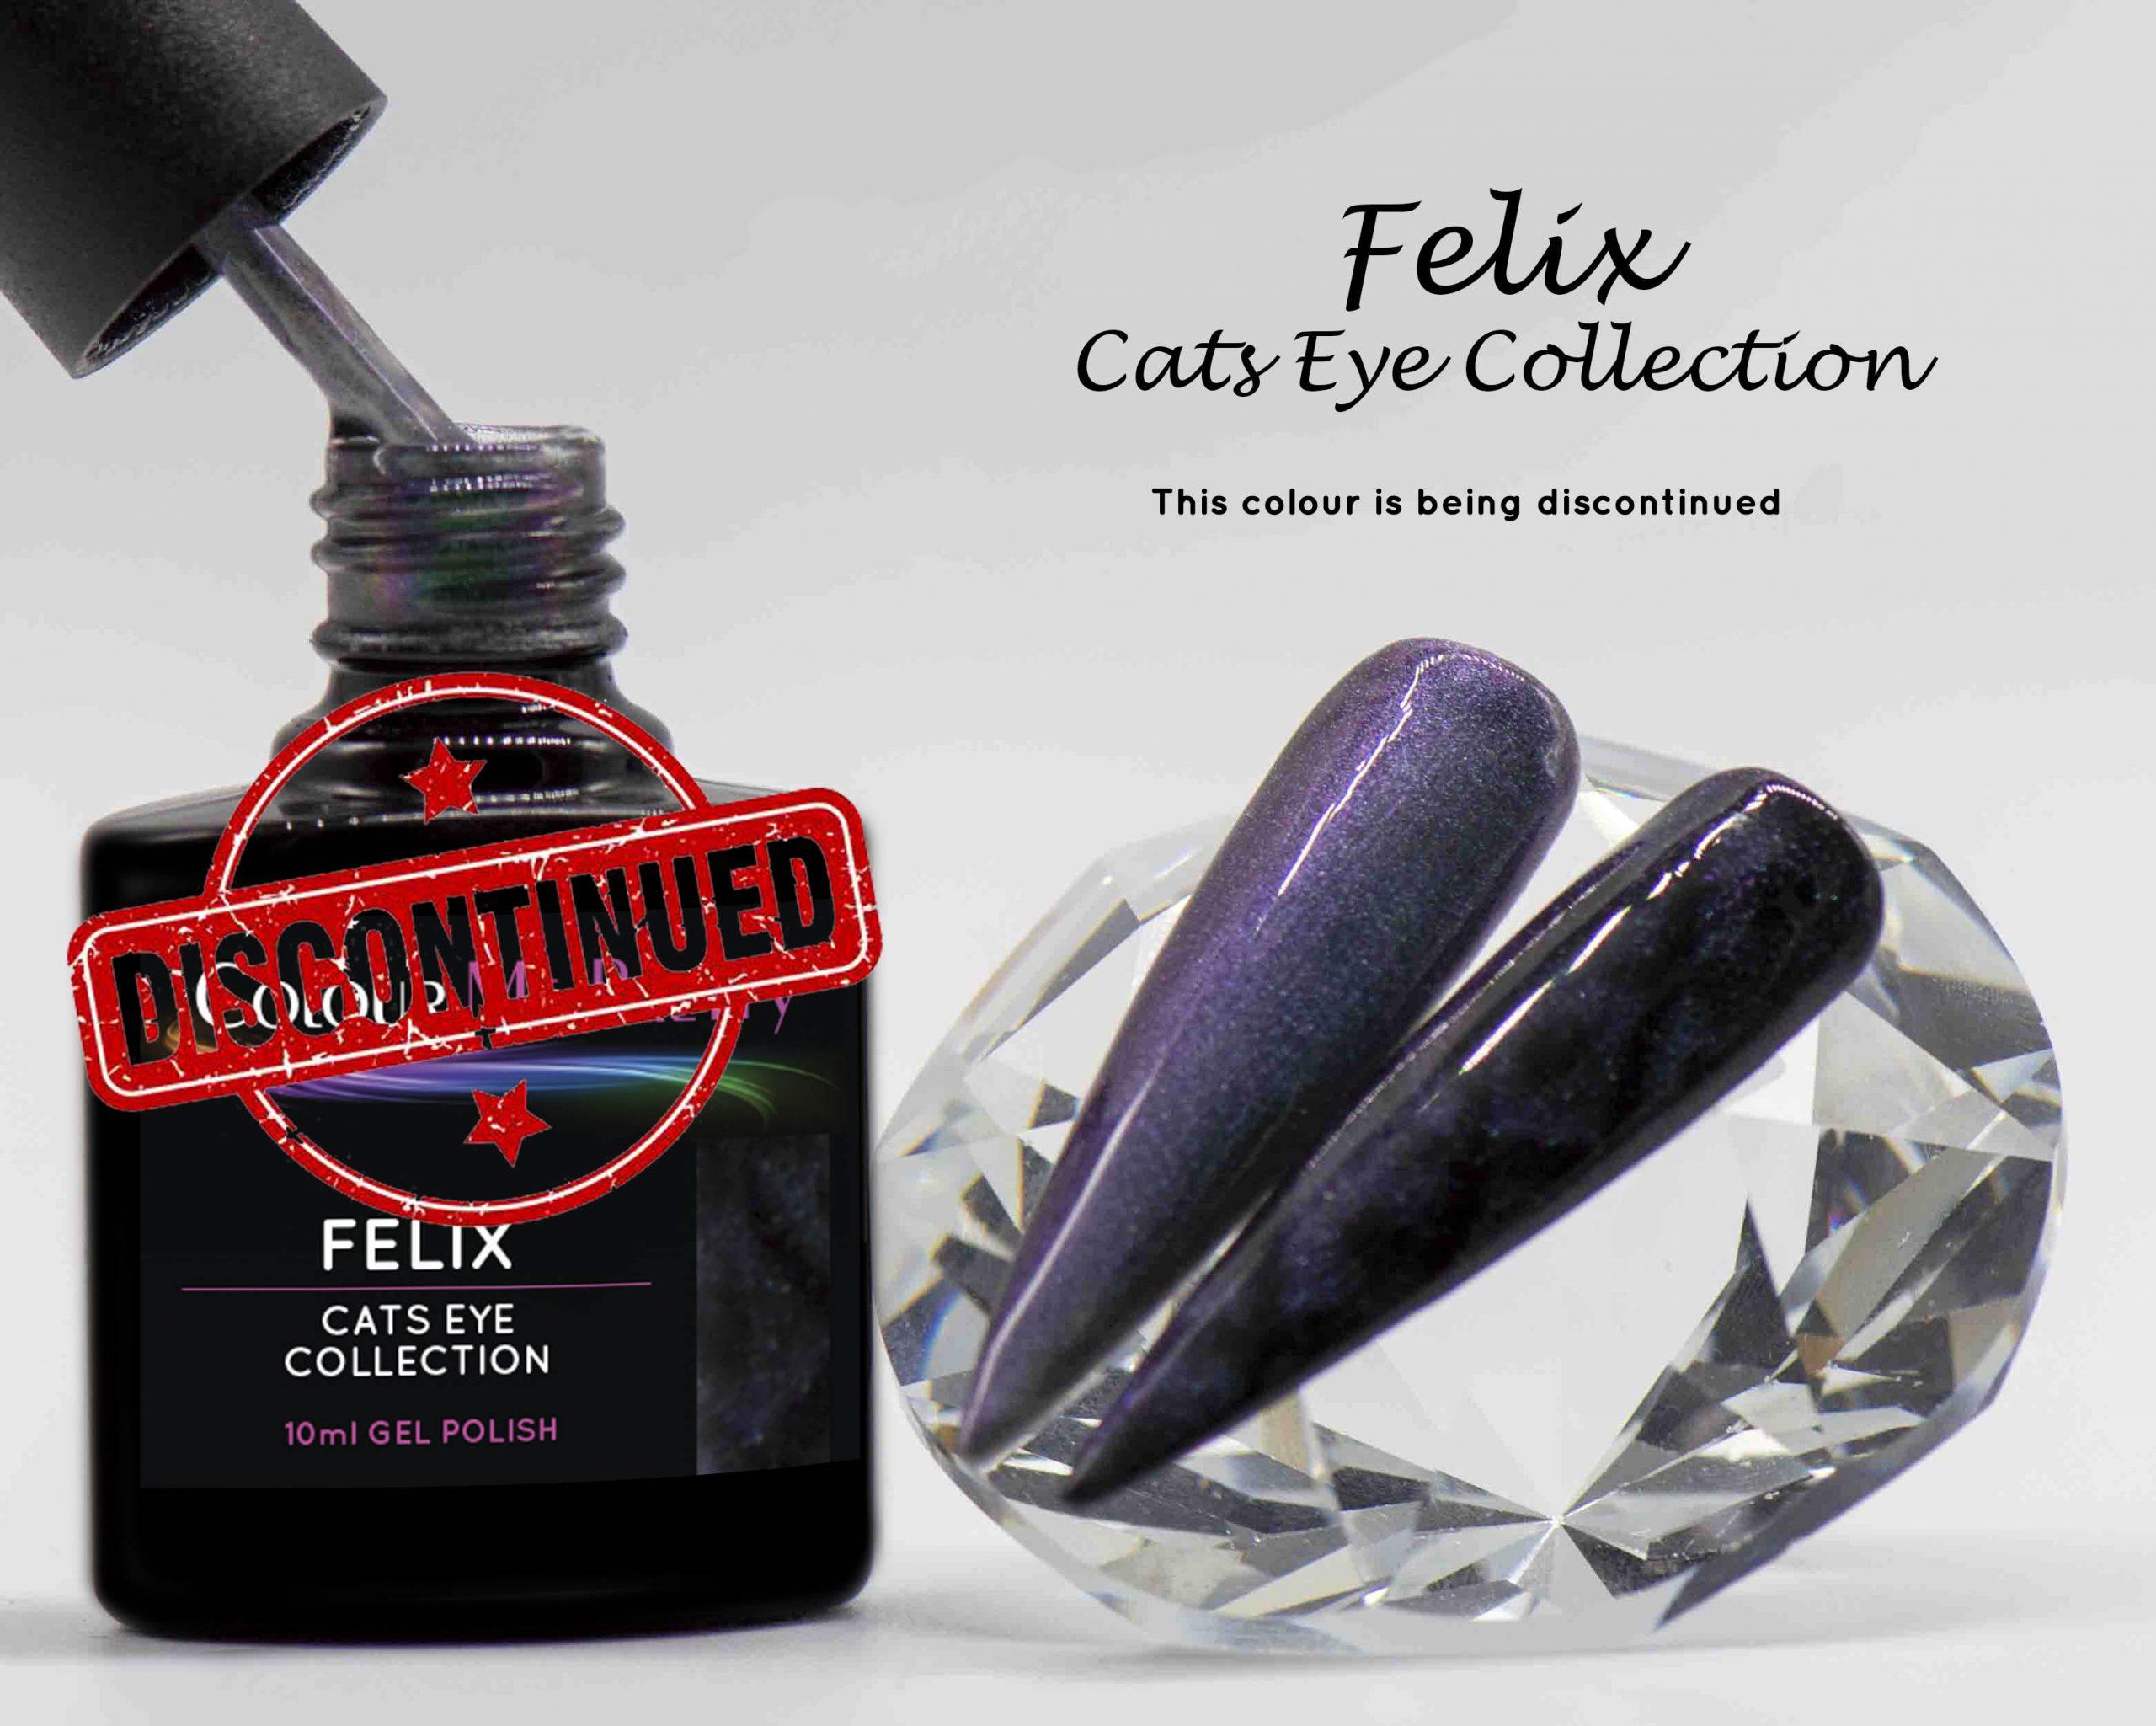 Cats Eye Felix Discontinued